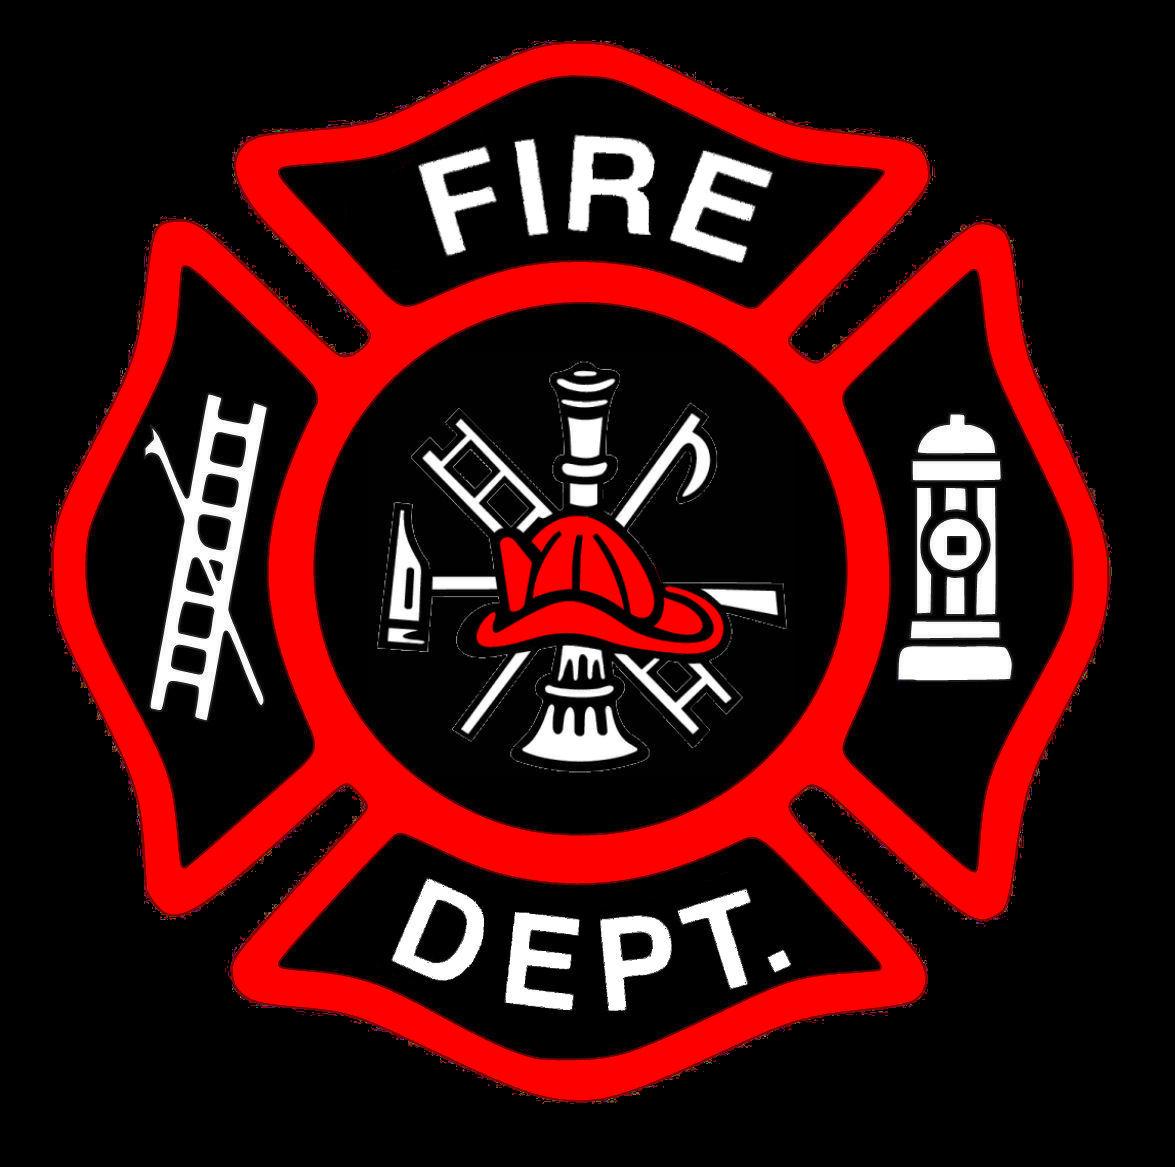 Firefighter Logo Clipart.